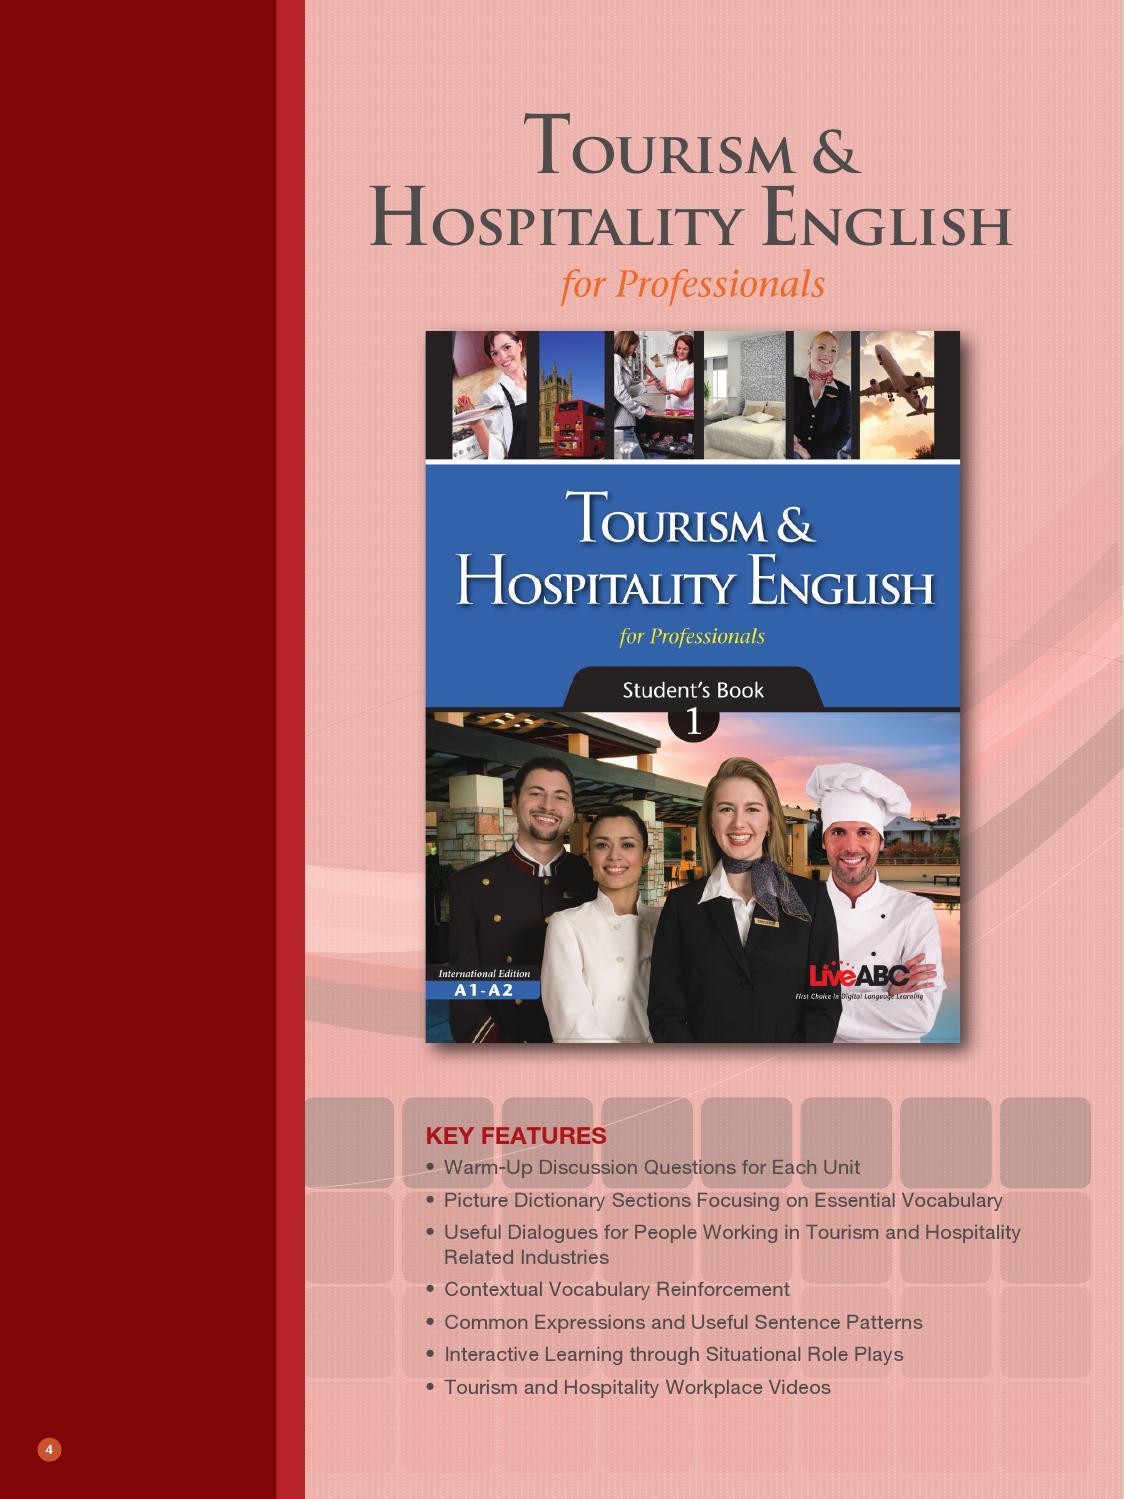 Tourism & hospitality english by liveabc - issuu